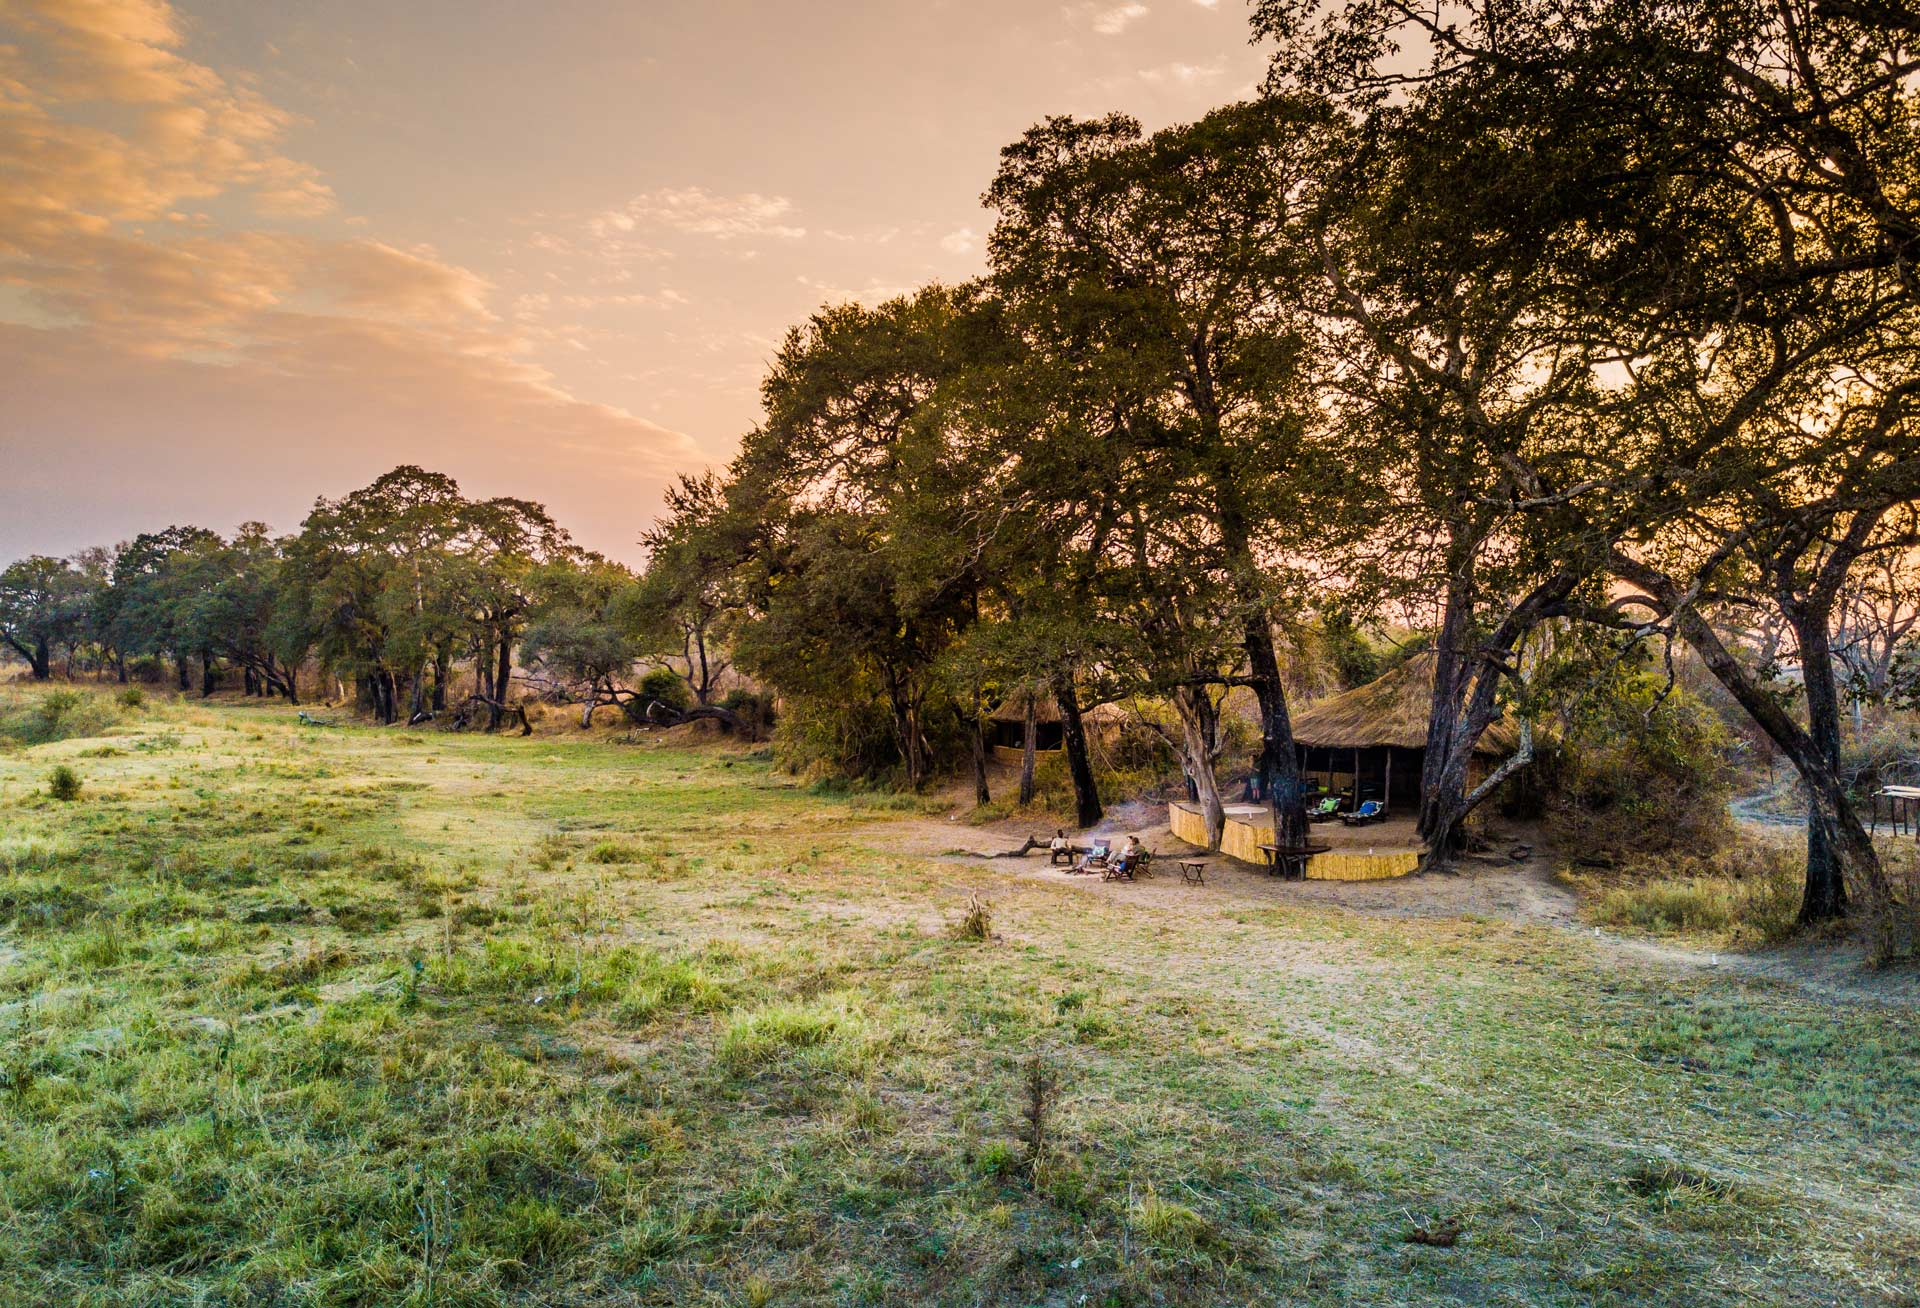 Sun setting behind Crocodile Camp in Zambia